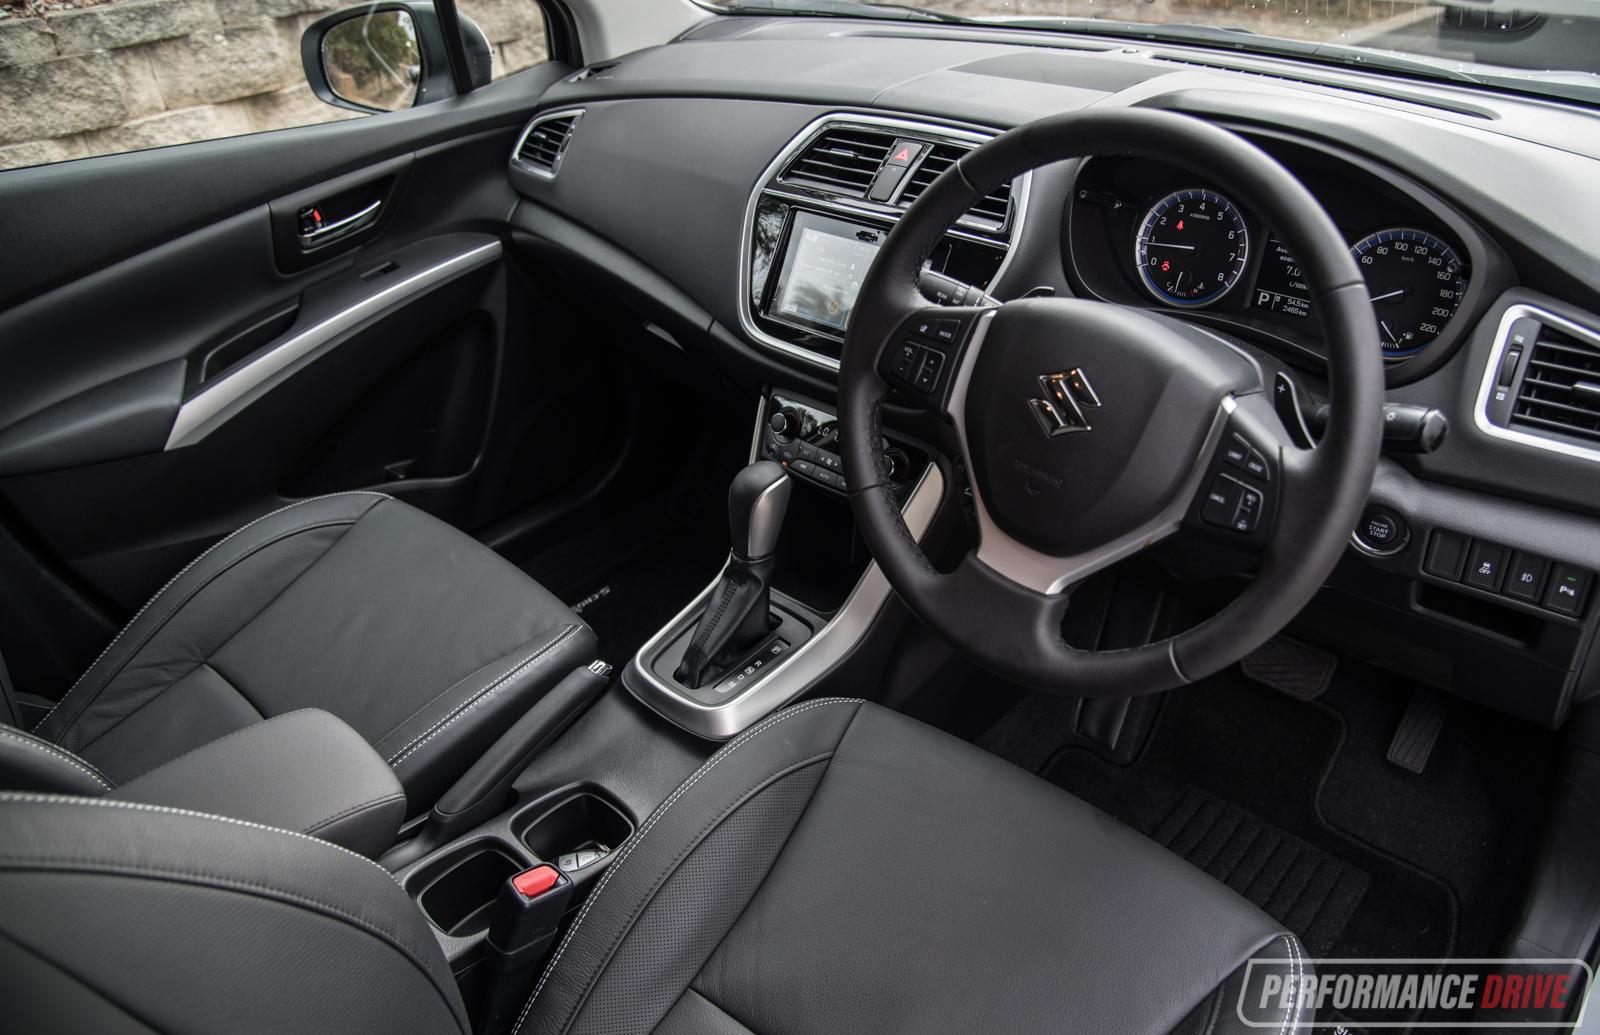 Suzuki Sx4 S Cross 2018 >> 2017 Suzuki S-Cross Turbo review (video) | PerformanceDrive